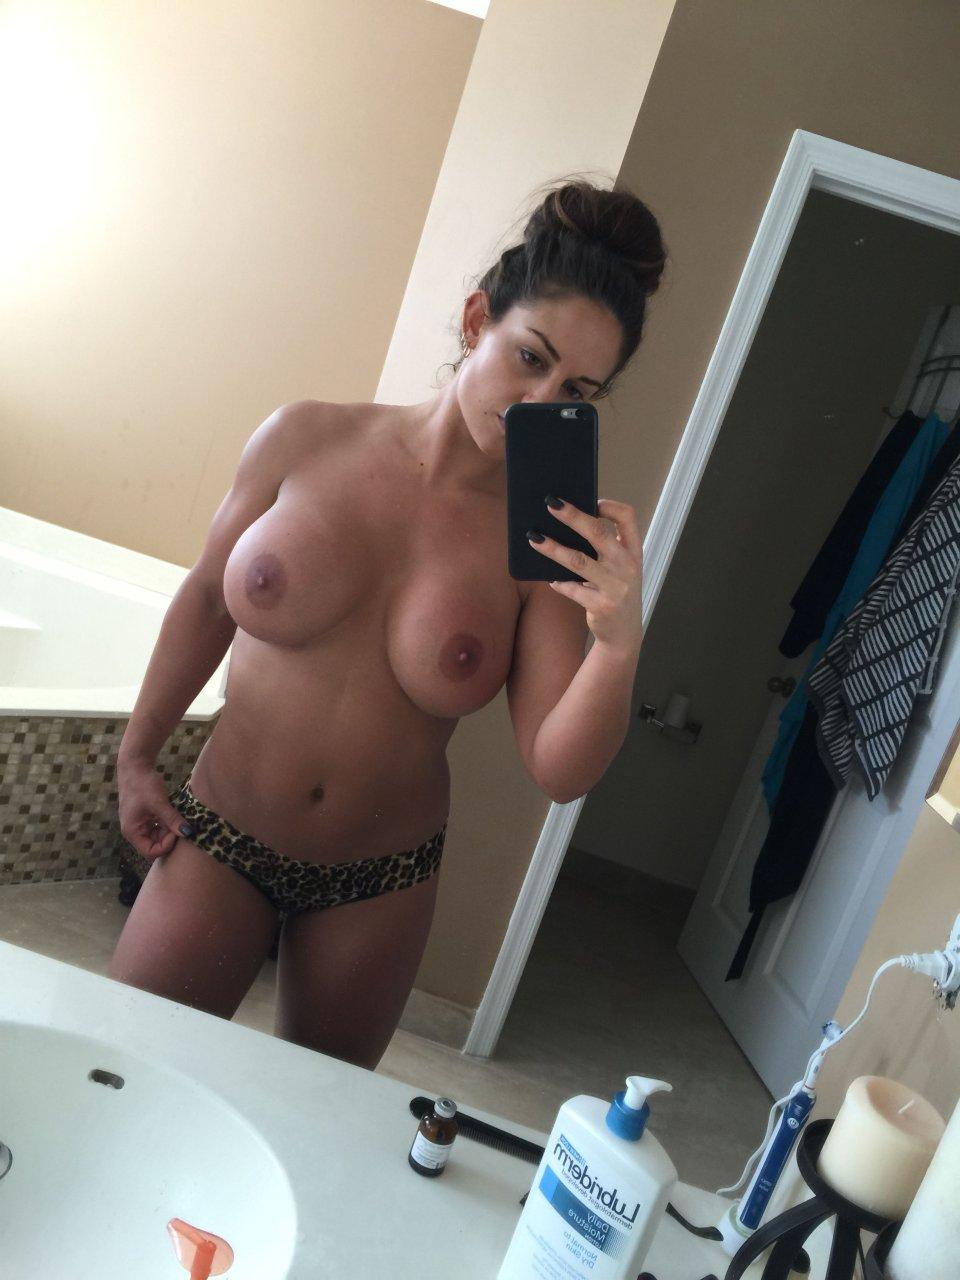 Tonya harding nude pictures